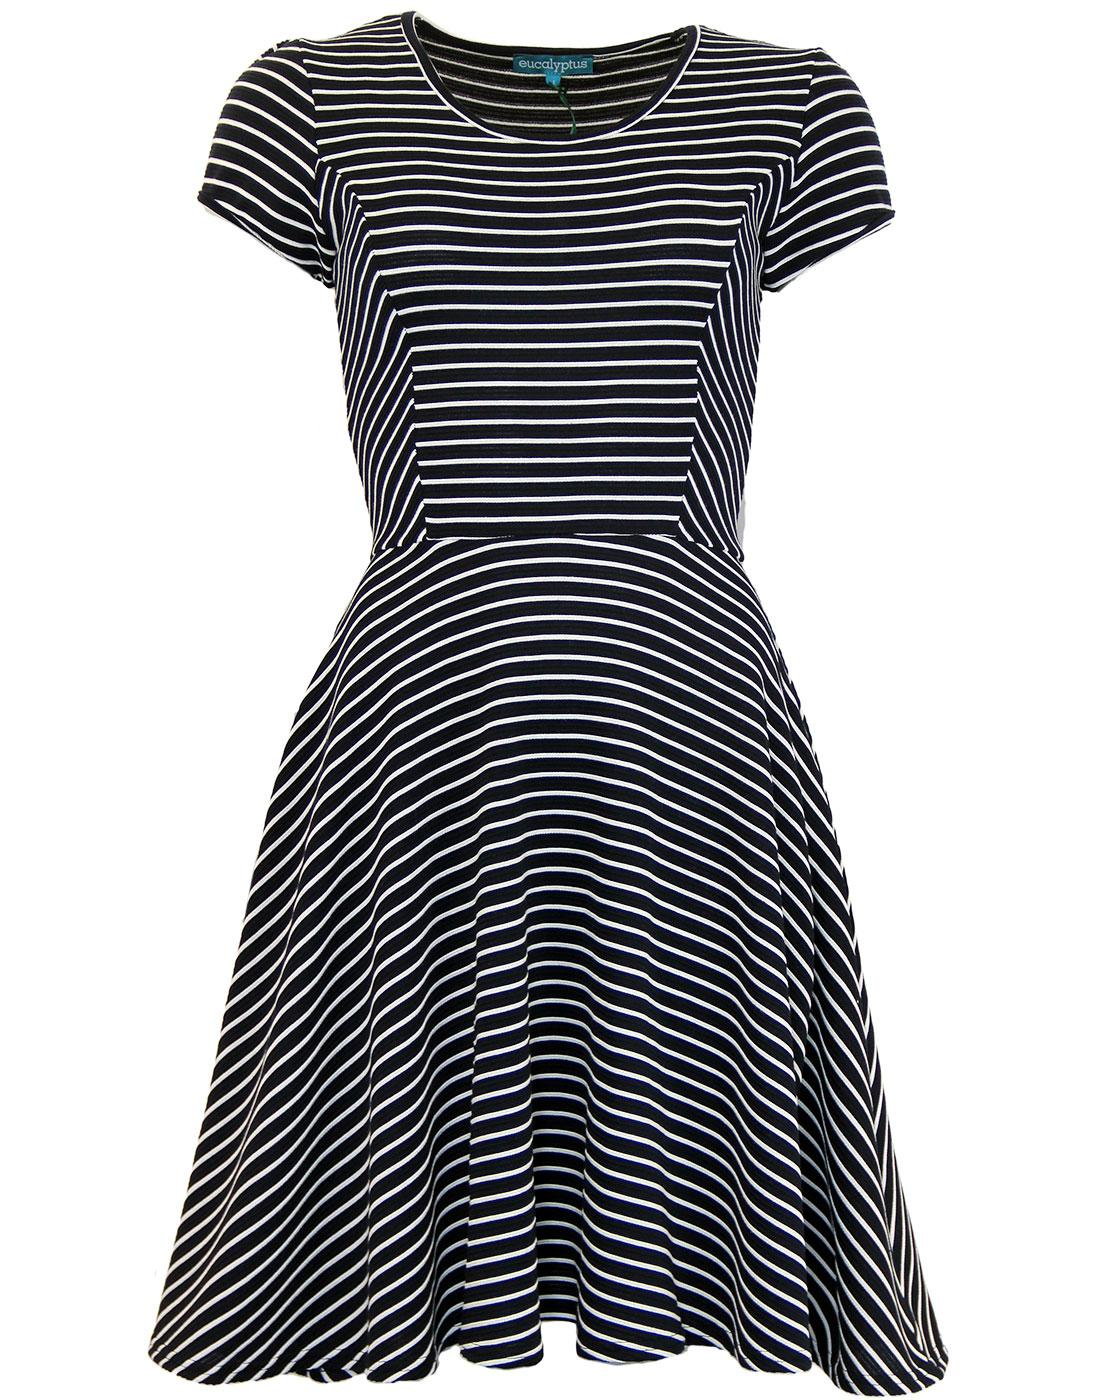 Sally EUCALYPTUS Retro 60s Mod Stripe Skater Dress